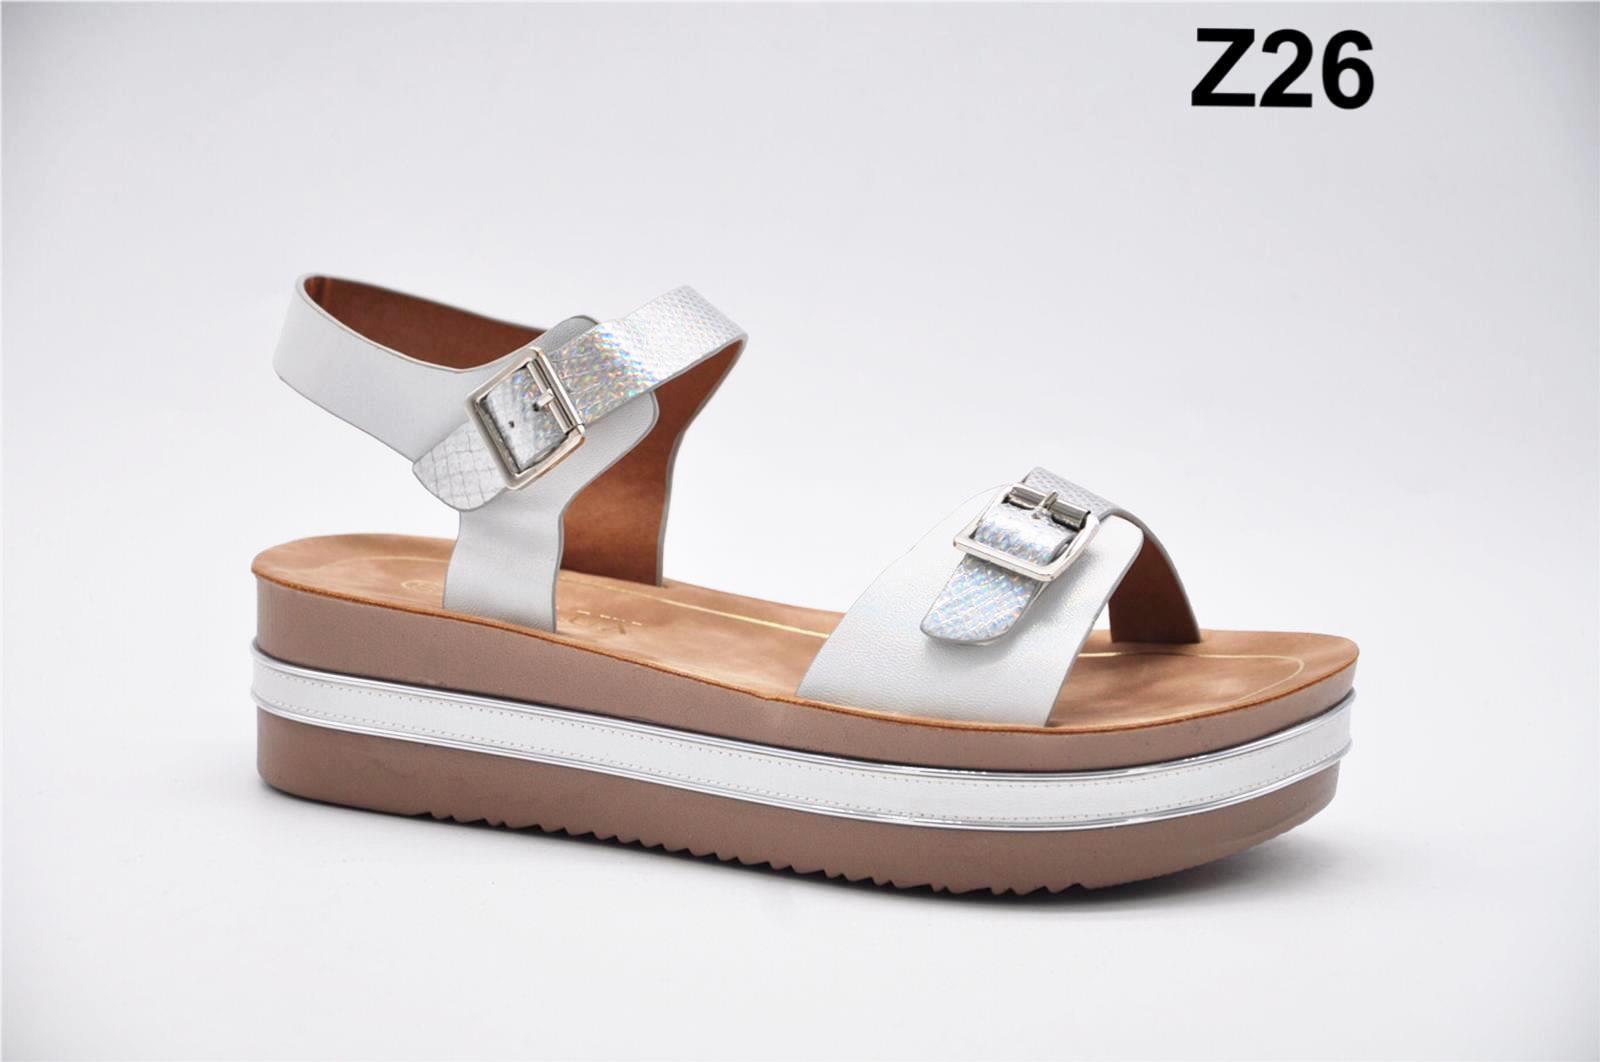 Sandale dama alb cu argintiu Monica2